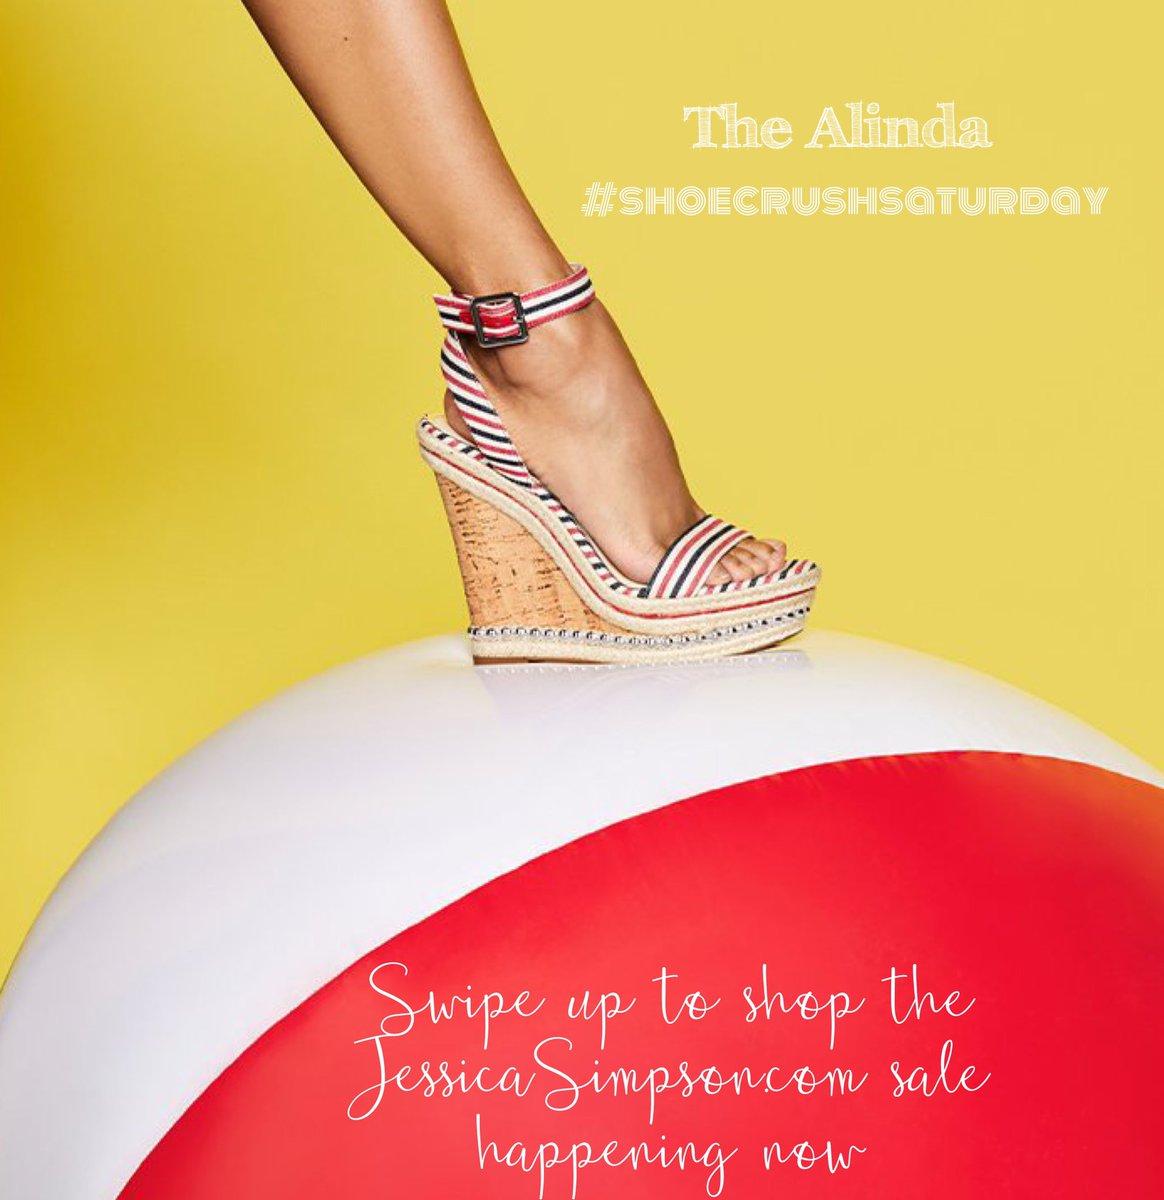 My #ShoeCrushSaturday: The Alinda  https://t.co/vxu5S6moVZ https://t.co/yHXmpowhii